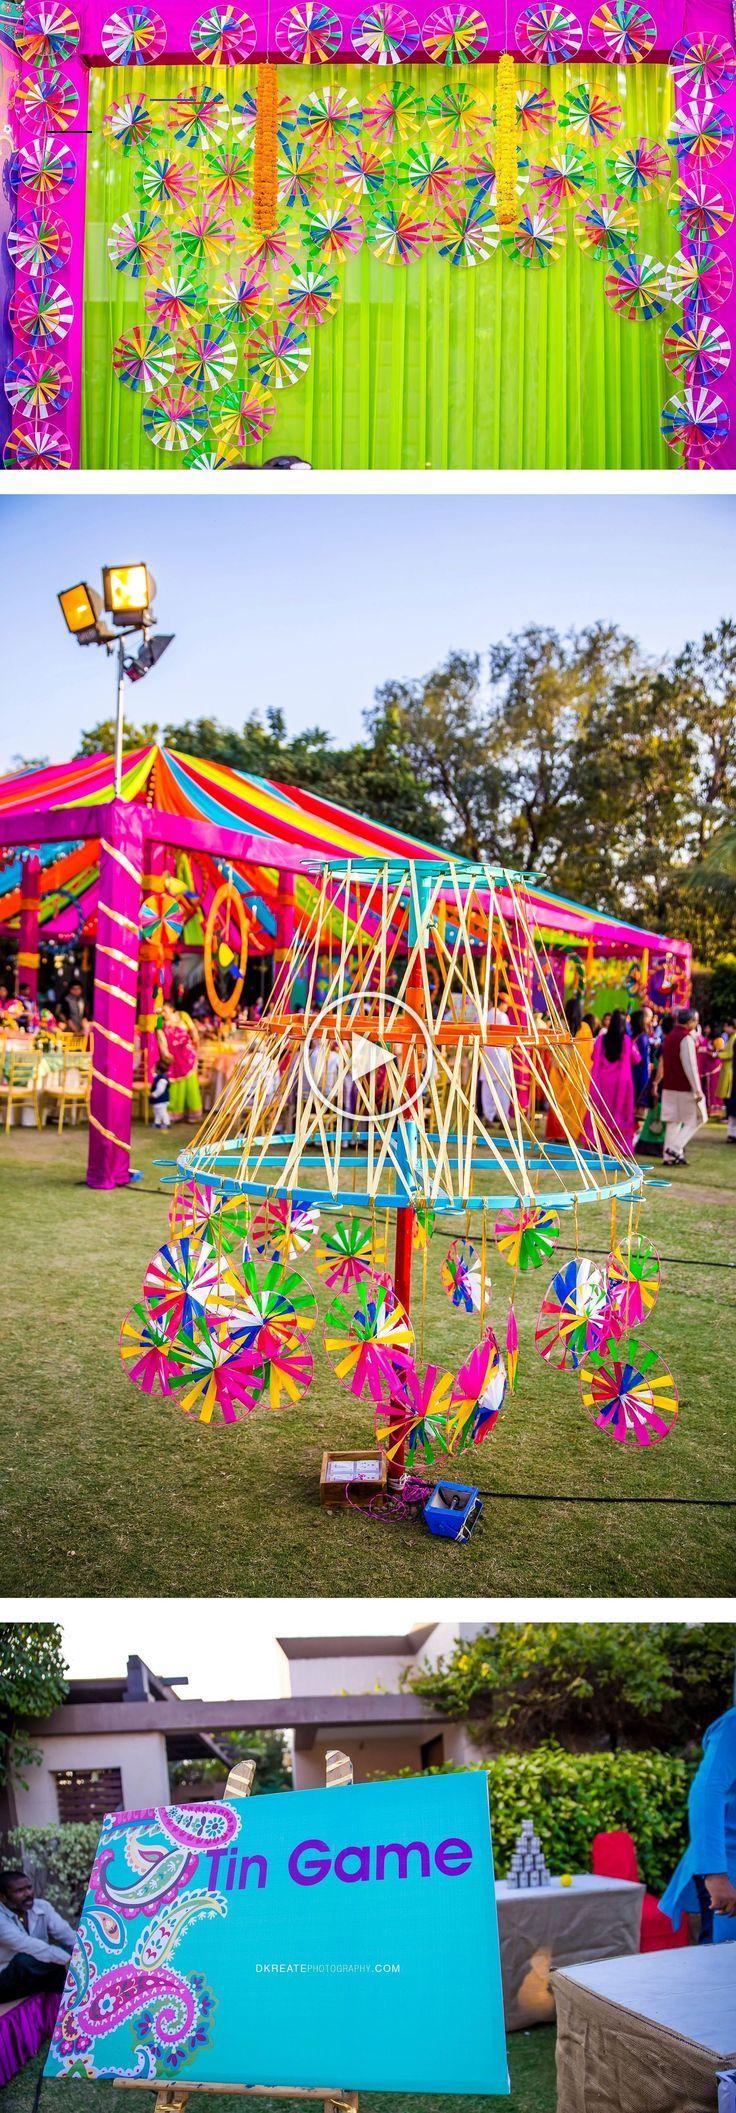 Indian Wedding Decor Inspiration |  Indian wedding backdrop ideas. Colorful. Mel... Indian Wedding Decor Inspiration |  Indian wedding backdrop ideas. Colorful. Mel... Indian Wedding Decor Inspiration | Indian wedding backdrop ideas. Colorful. Mel... Indian Wedding Decor Inspiration | In...  #Backdrop #Colorful #decor<br>